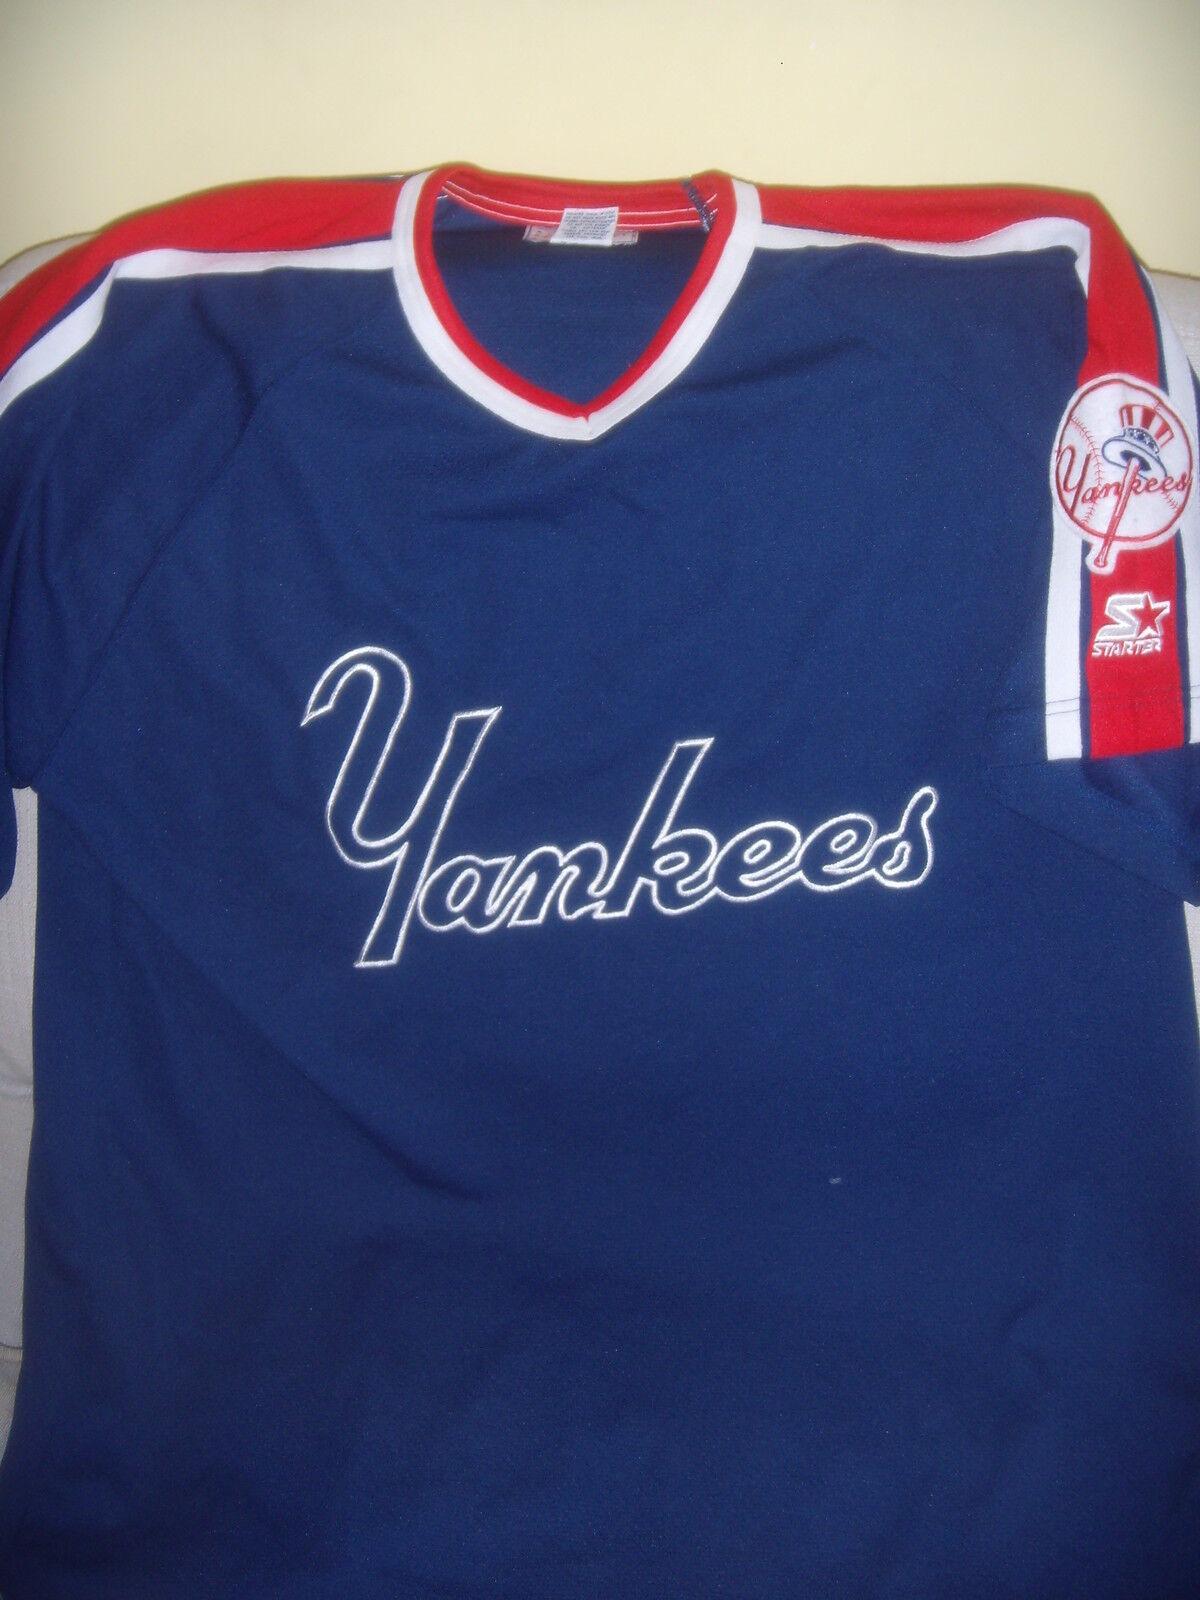 FELPA BASEBALL U.S.A.  NEW YORK YORK YORK YANKEES MAJOR LEAGUE BASEBALL M.L.B. 65b96b